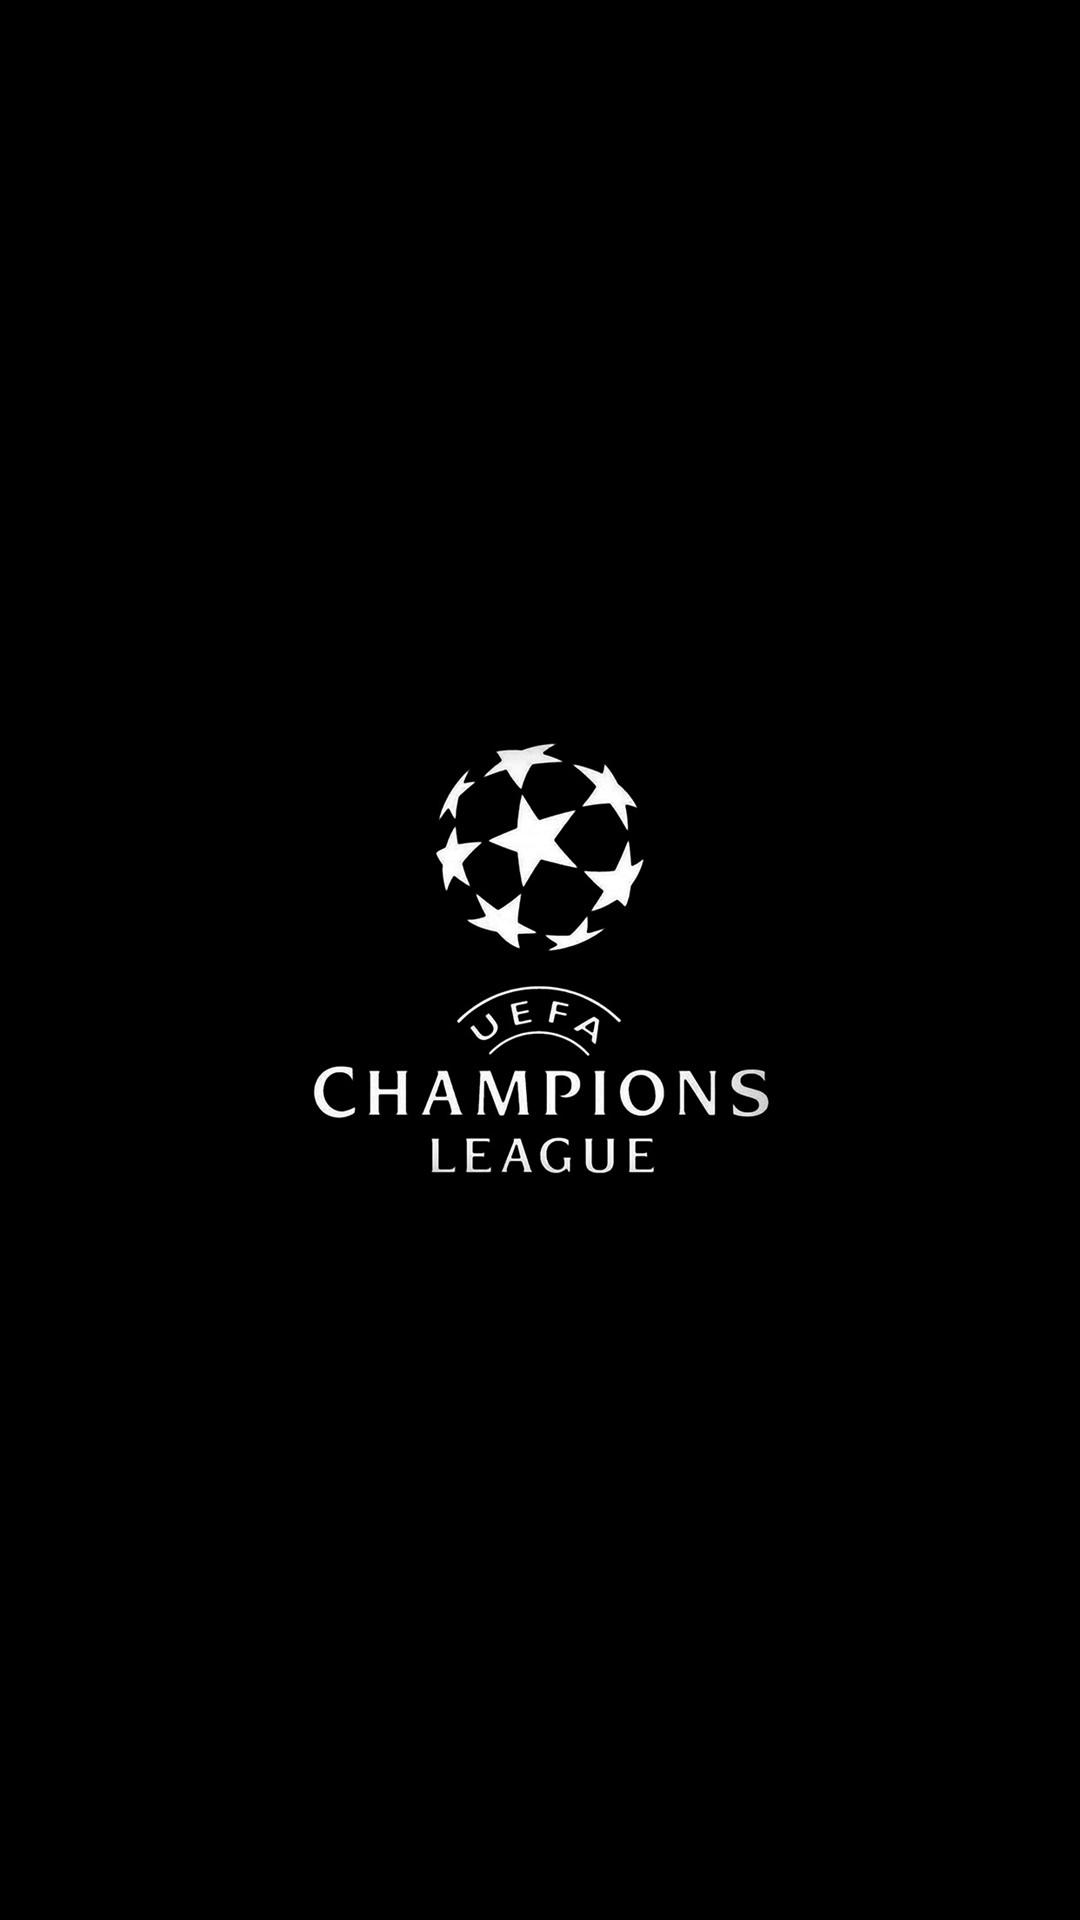 Champions League Europe Logo Soccer Art Illustration Dark Bw #iPhone #6 # wallpaper